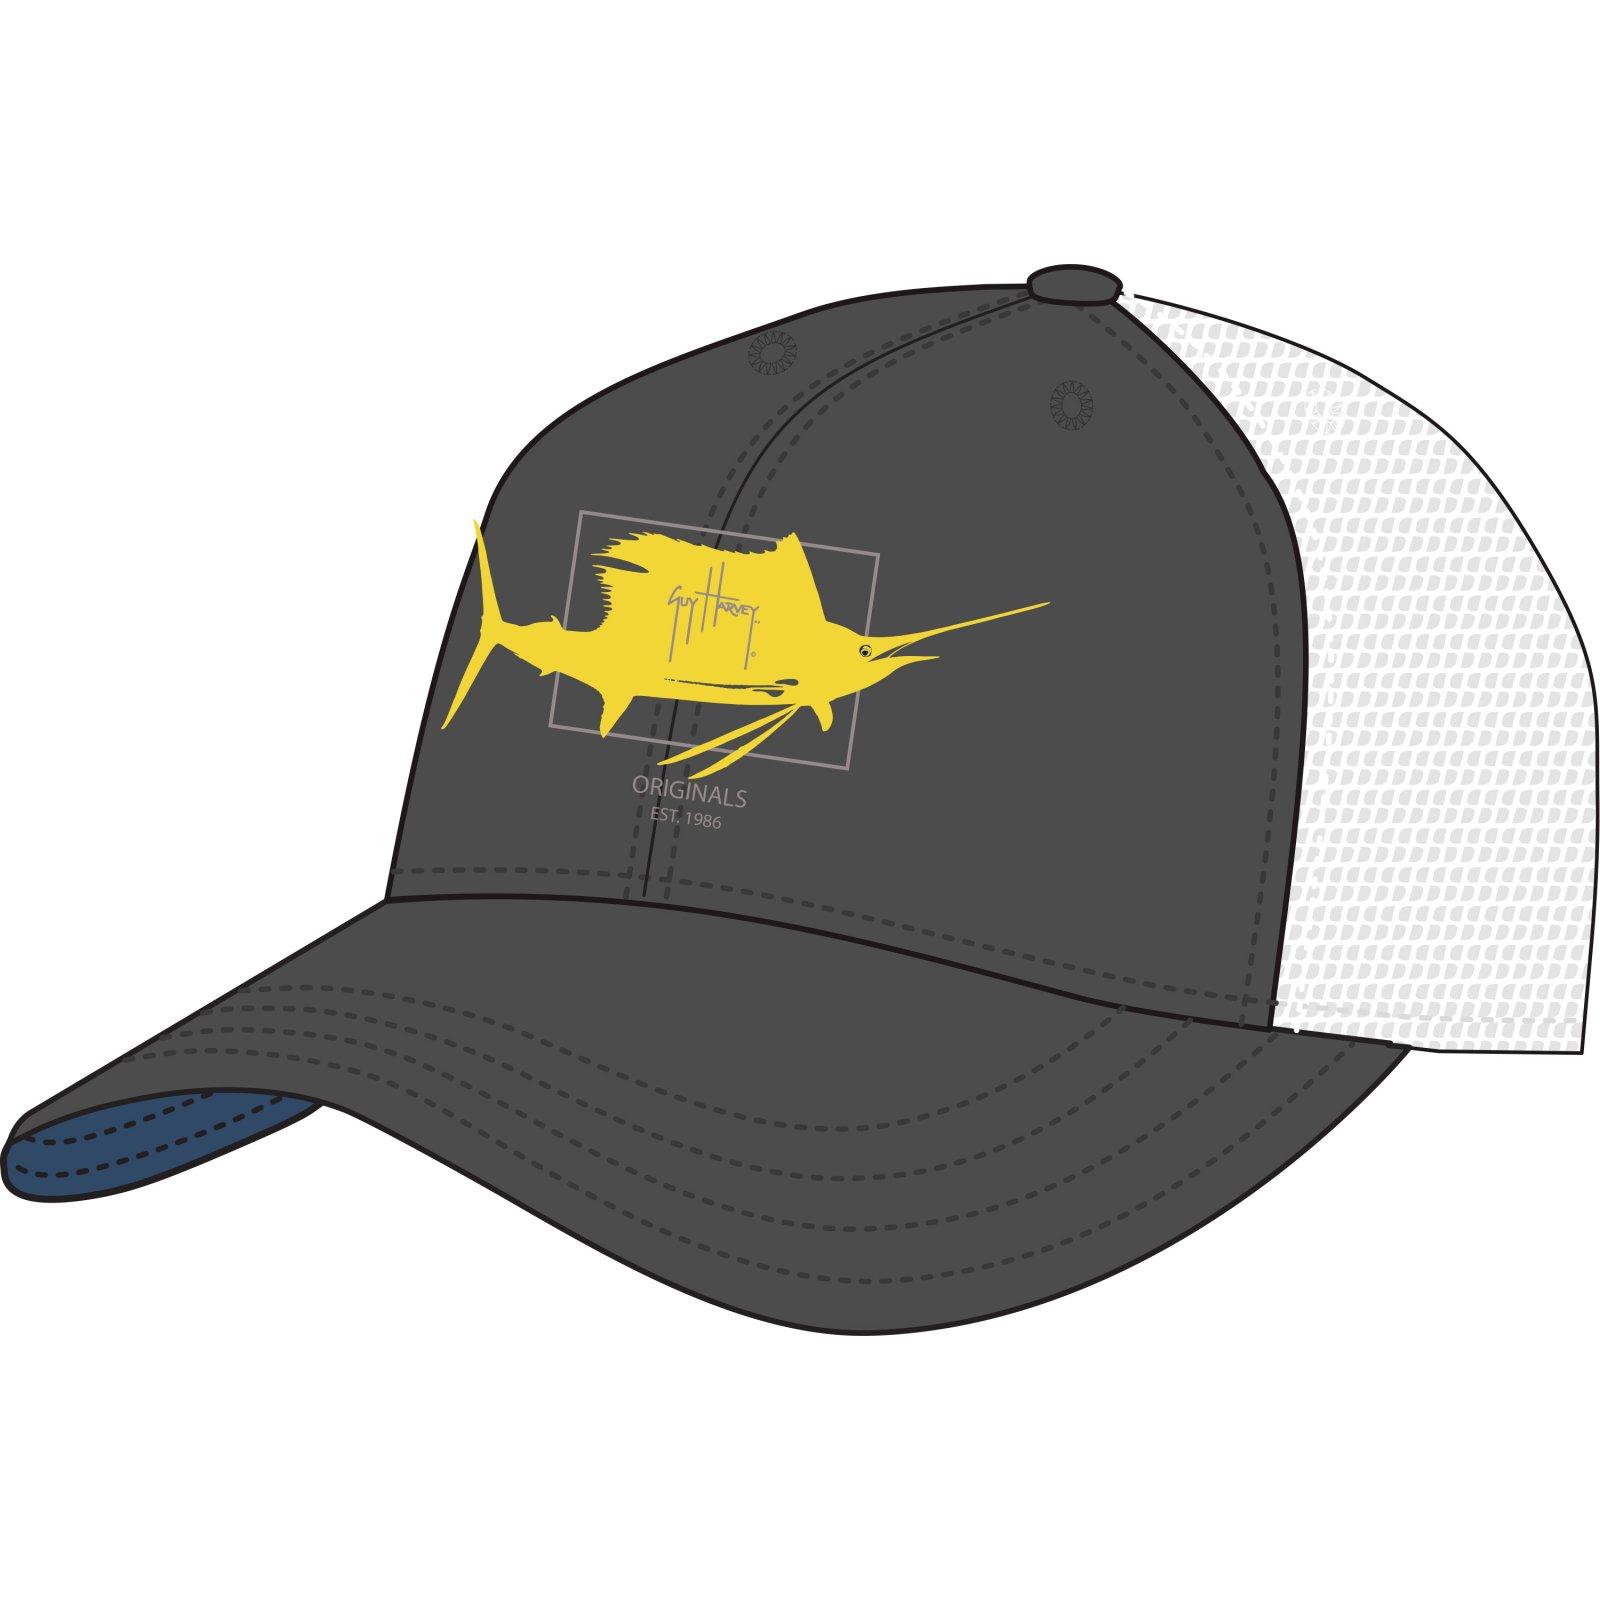 671a8b7d5eca6 Guy Harvey Logo Hat Charcoal